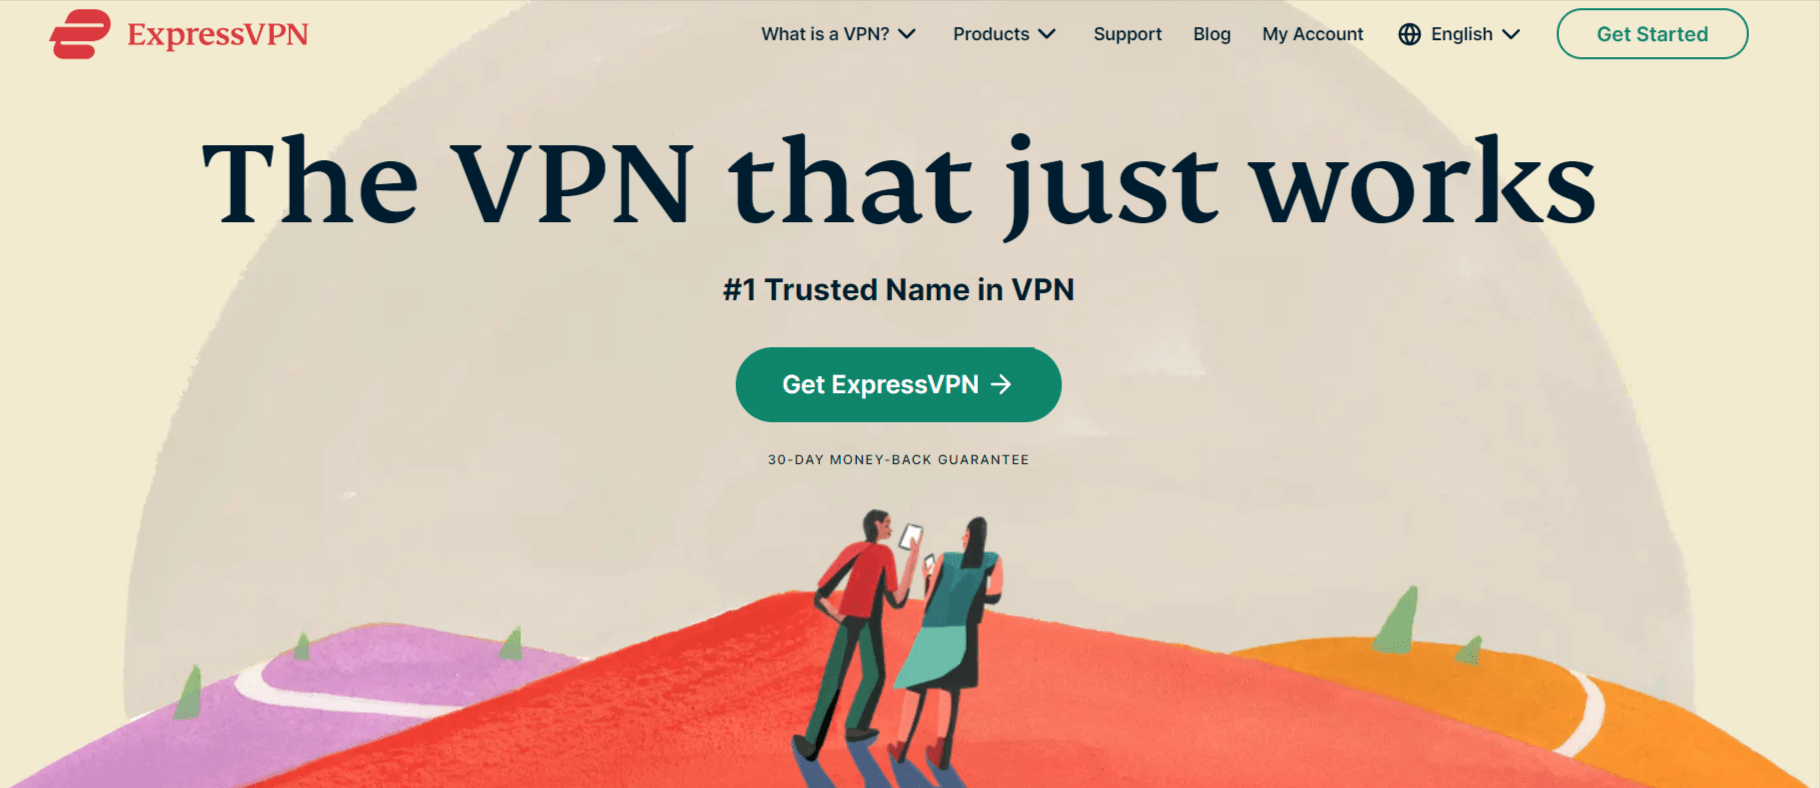 ExpressVPN Review- Overview